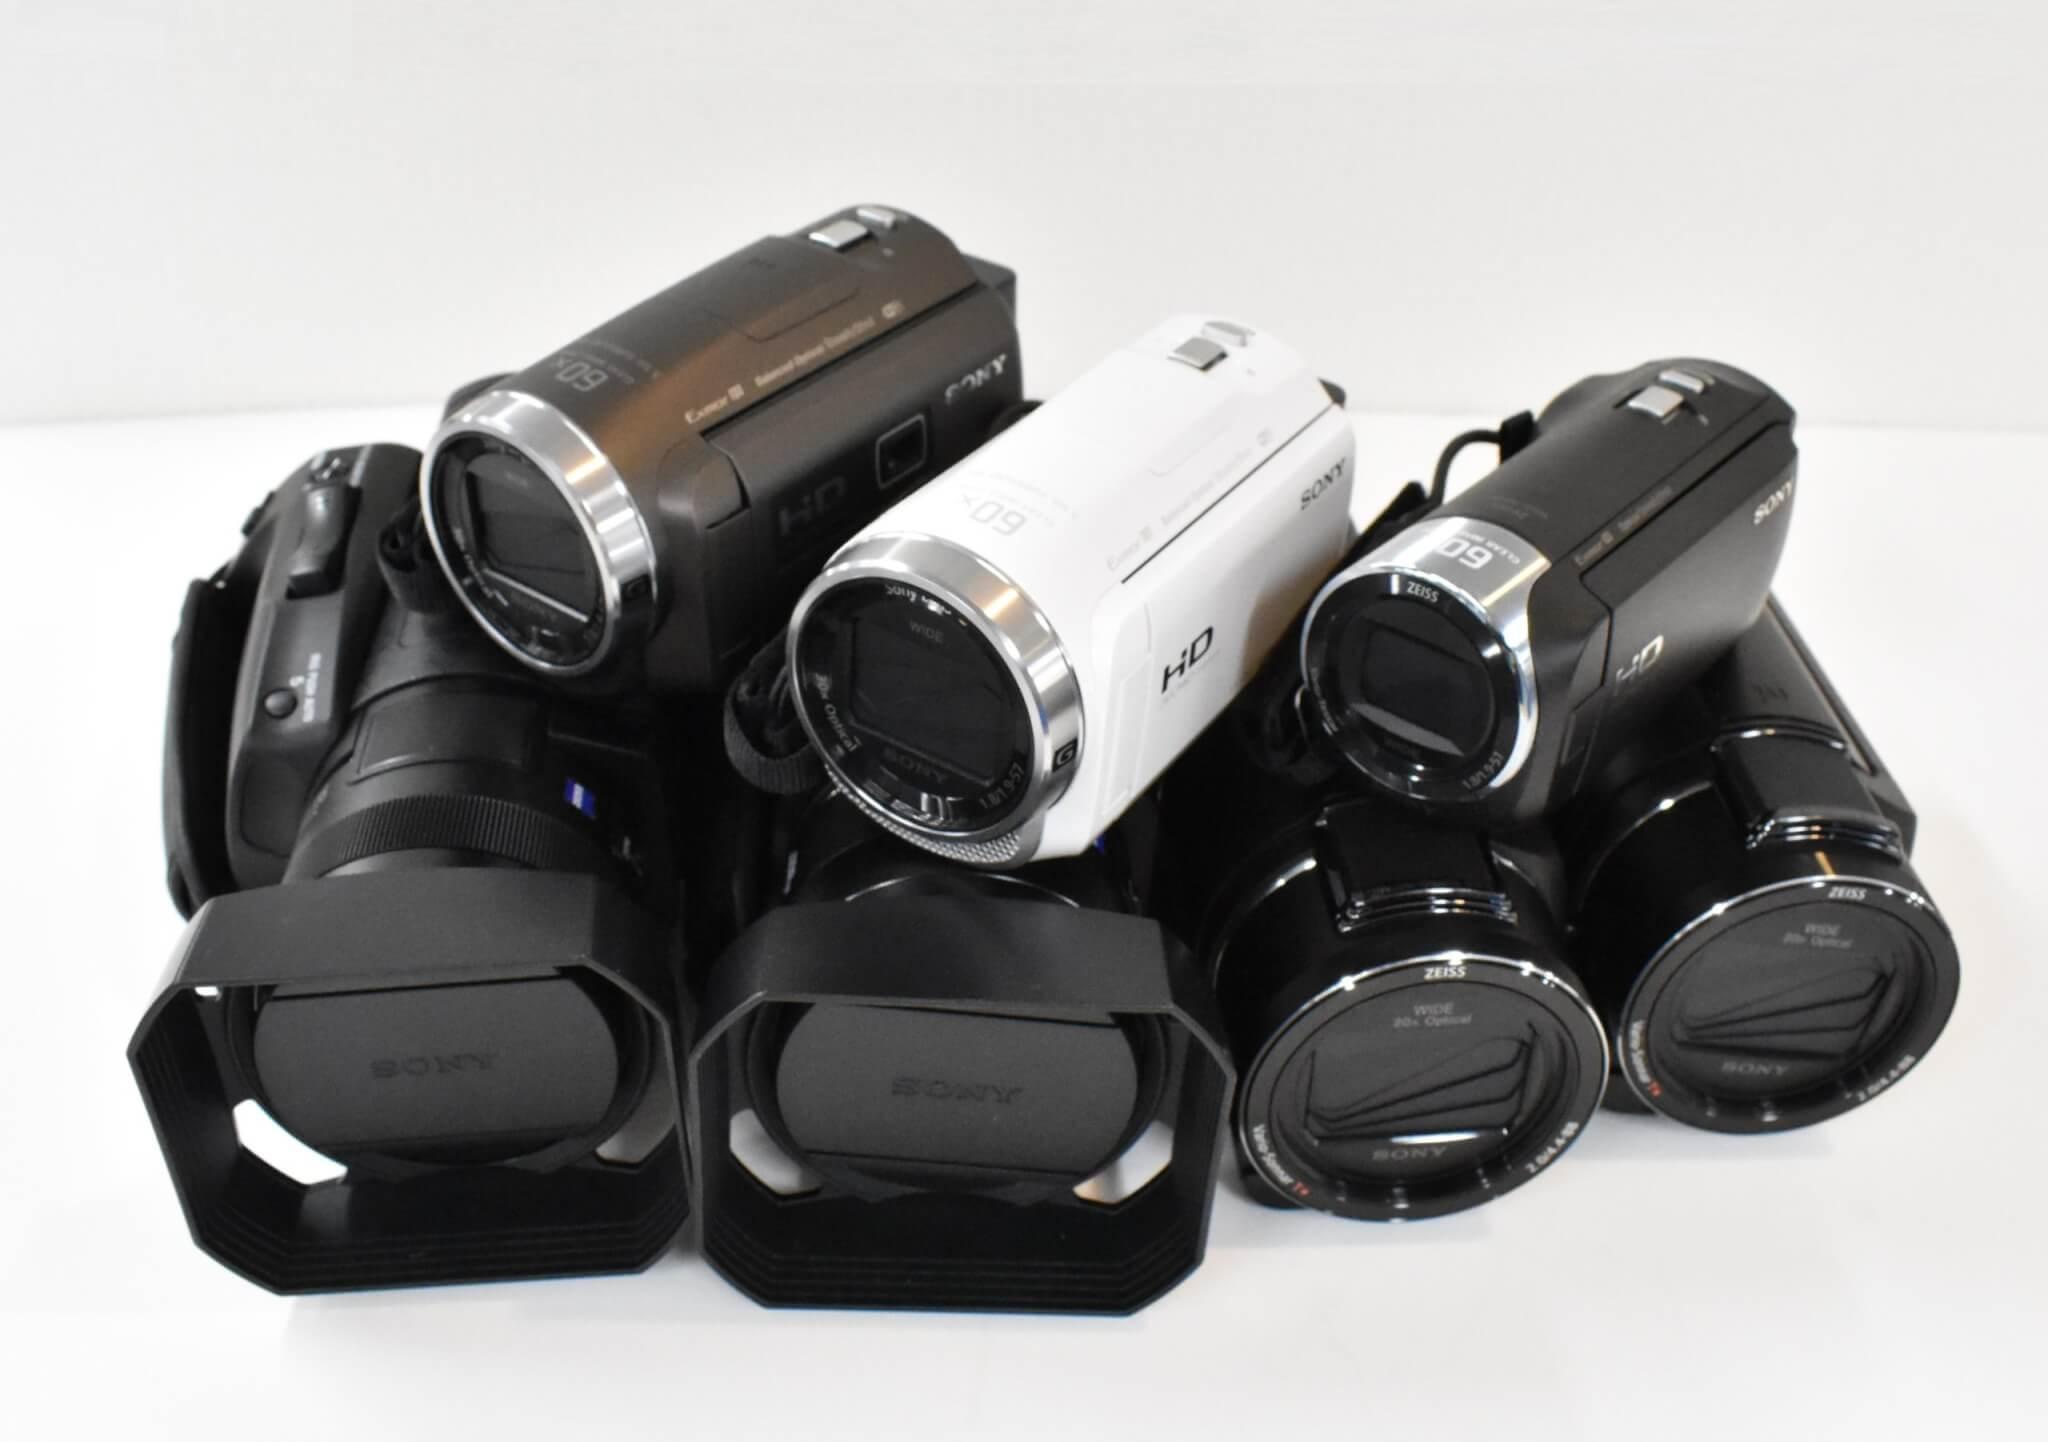 "[2020] SONYビデオカメラ""ハンディカム"" 最新全7機種を比較!おすすめと選び方を徹底解説"